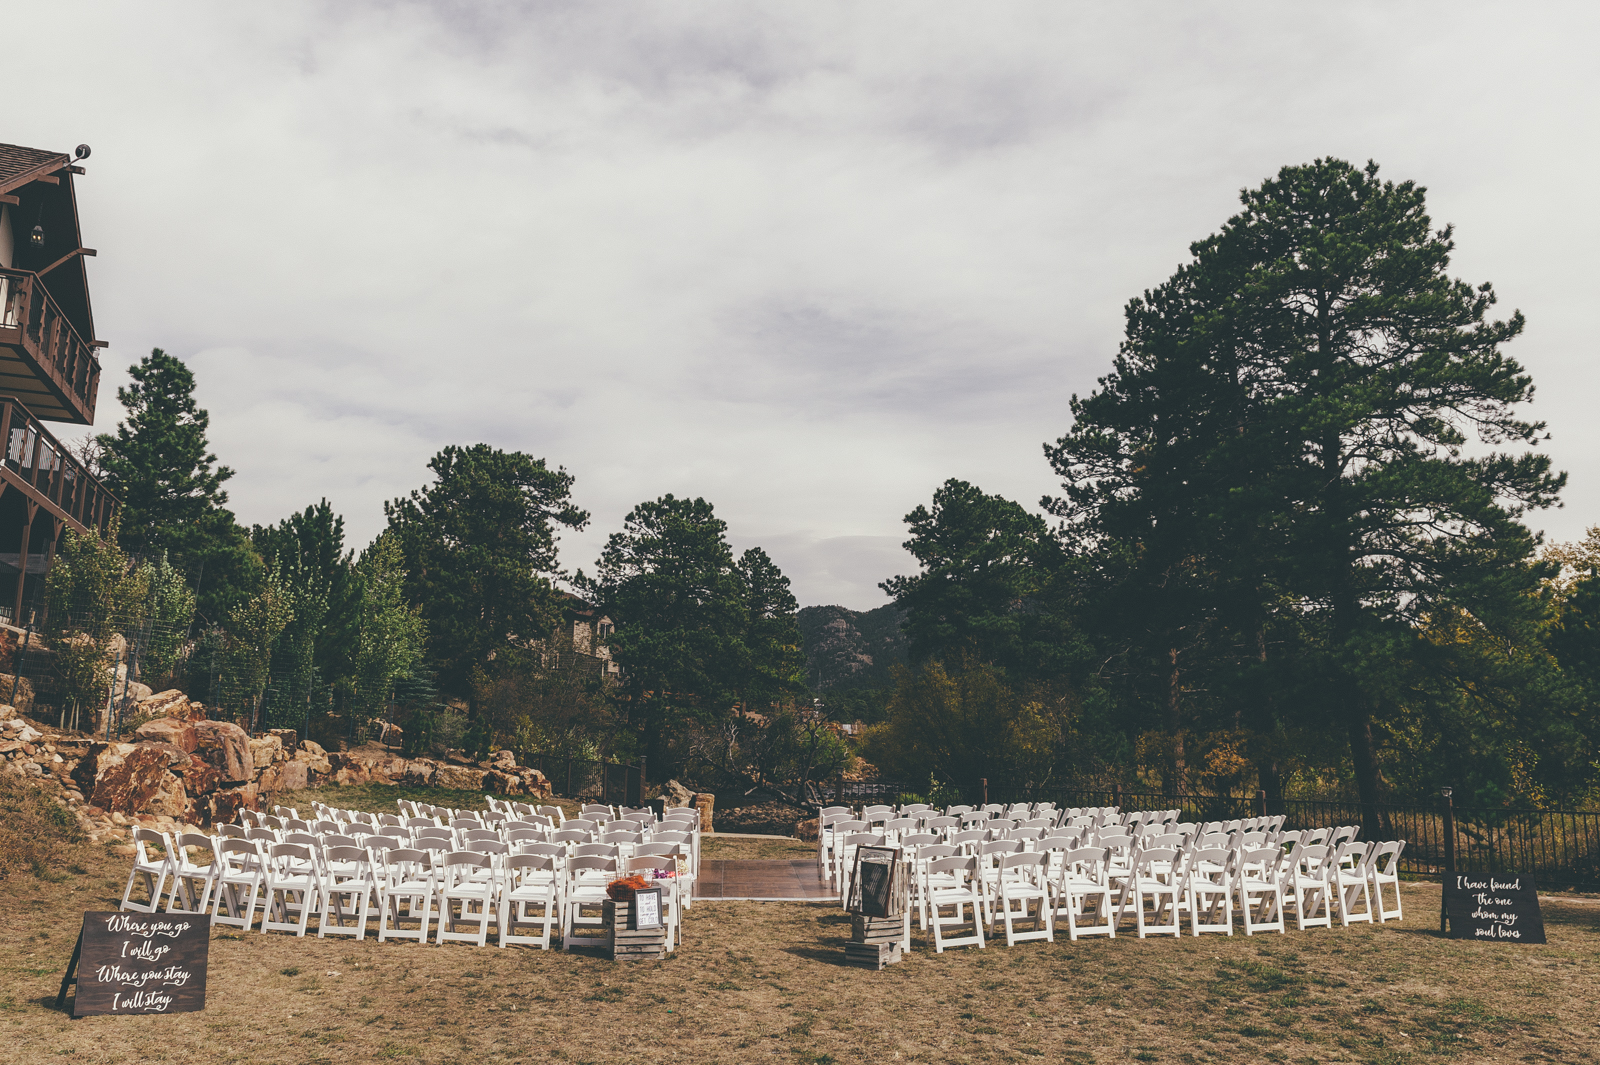 ChadFahnestockPhotography-estes-park-wedding-photography-008.jpg